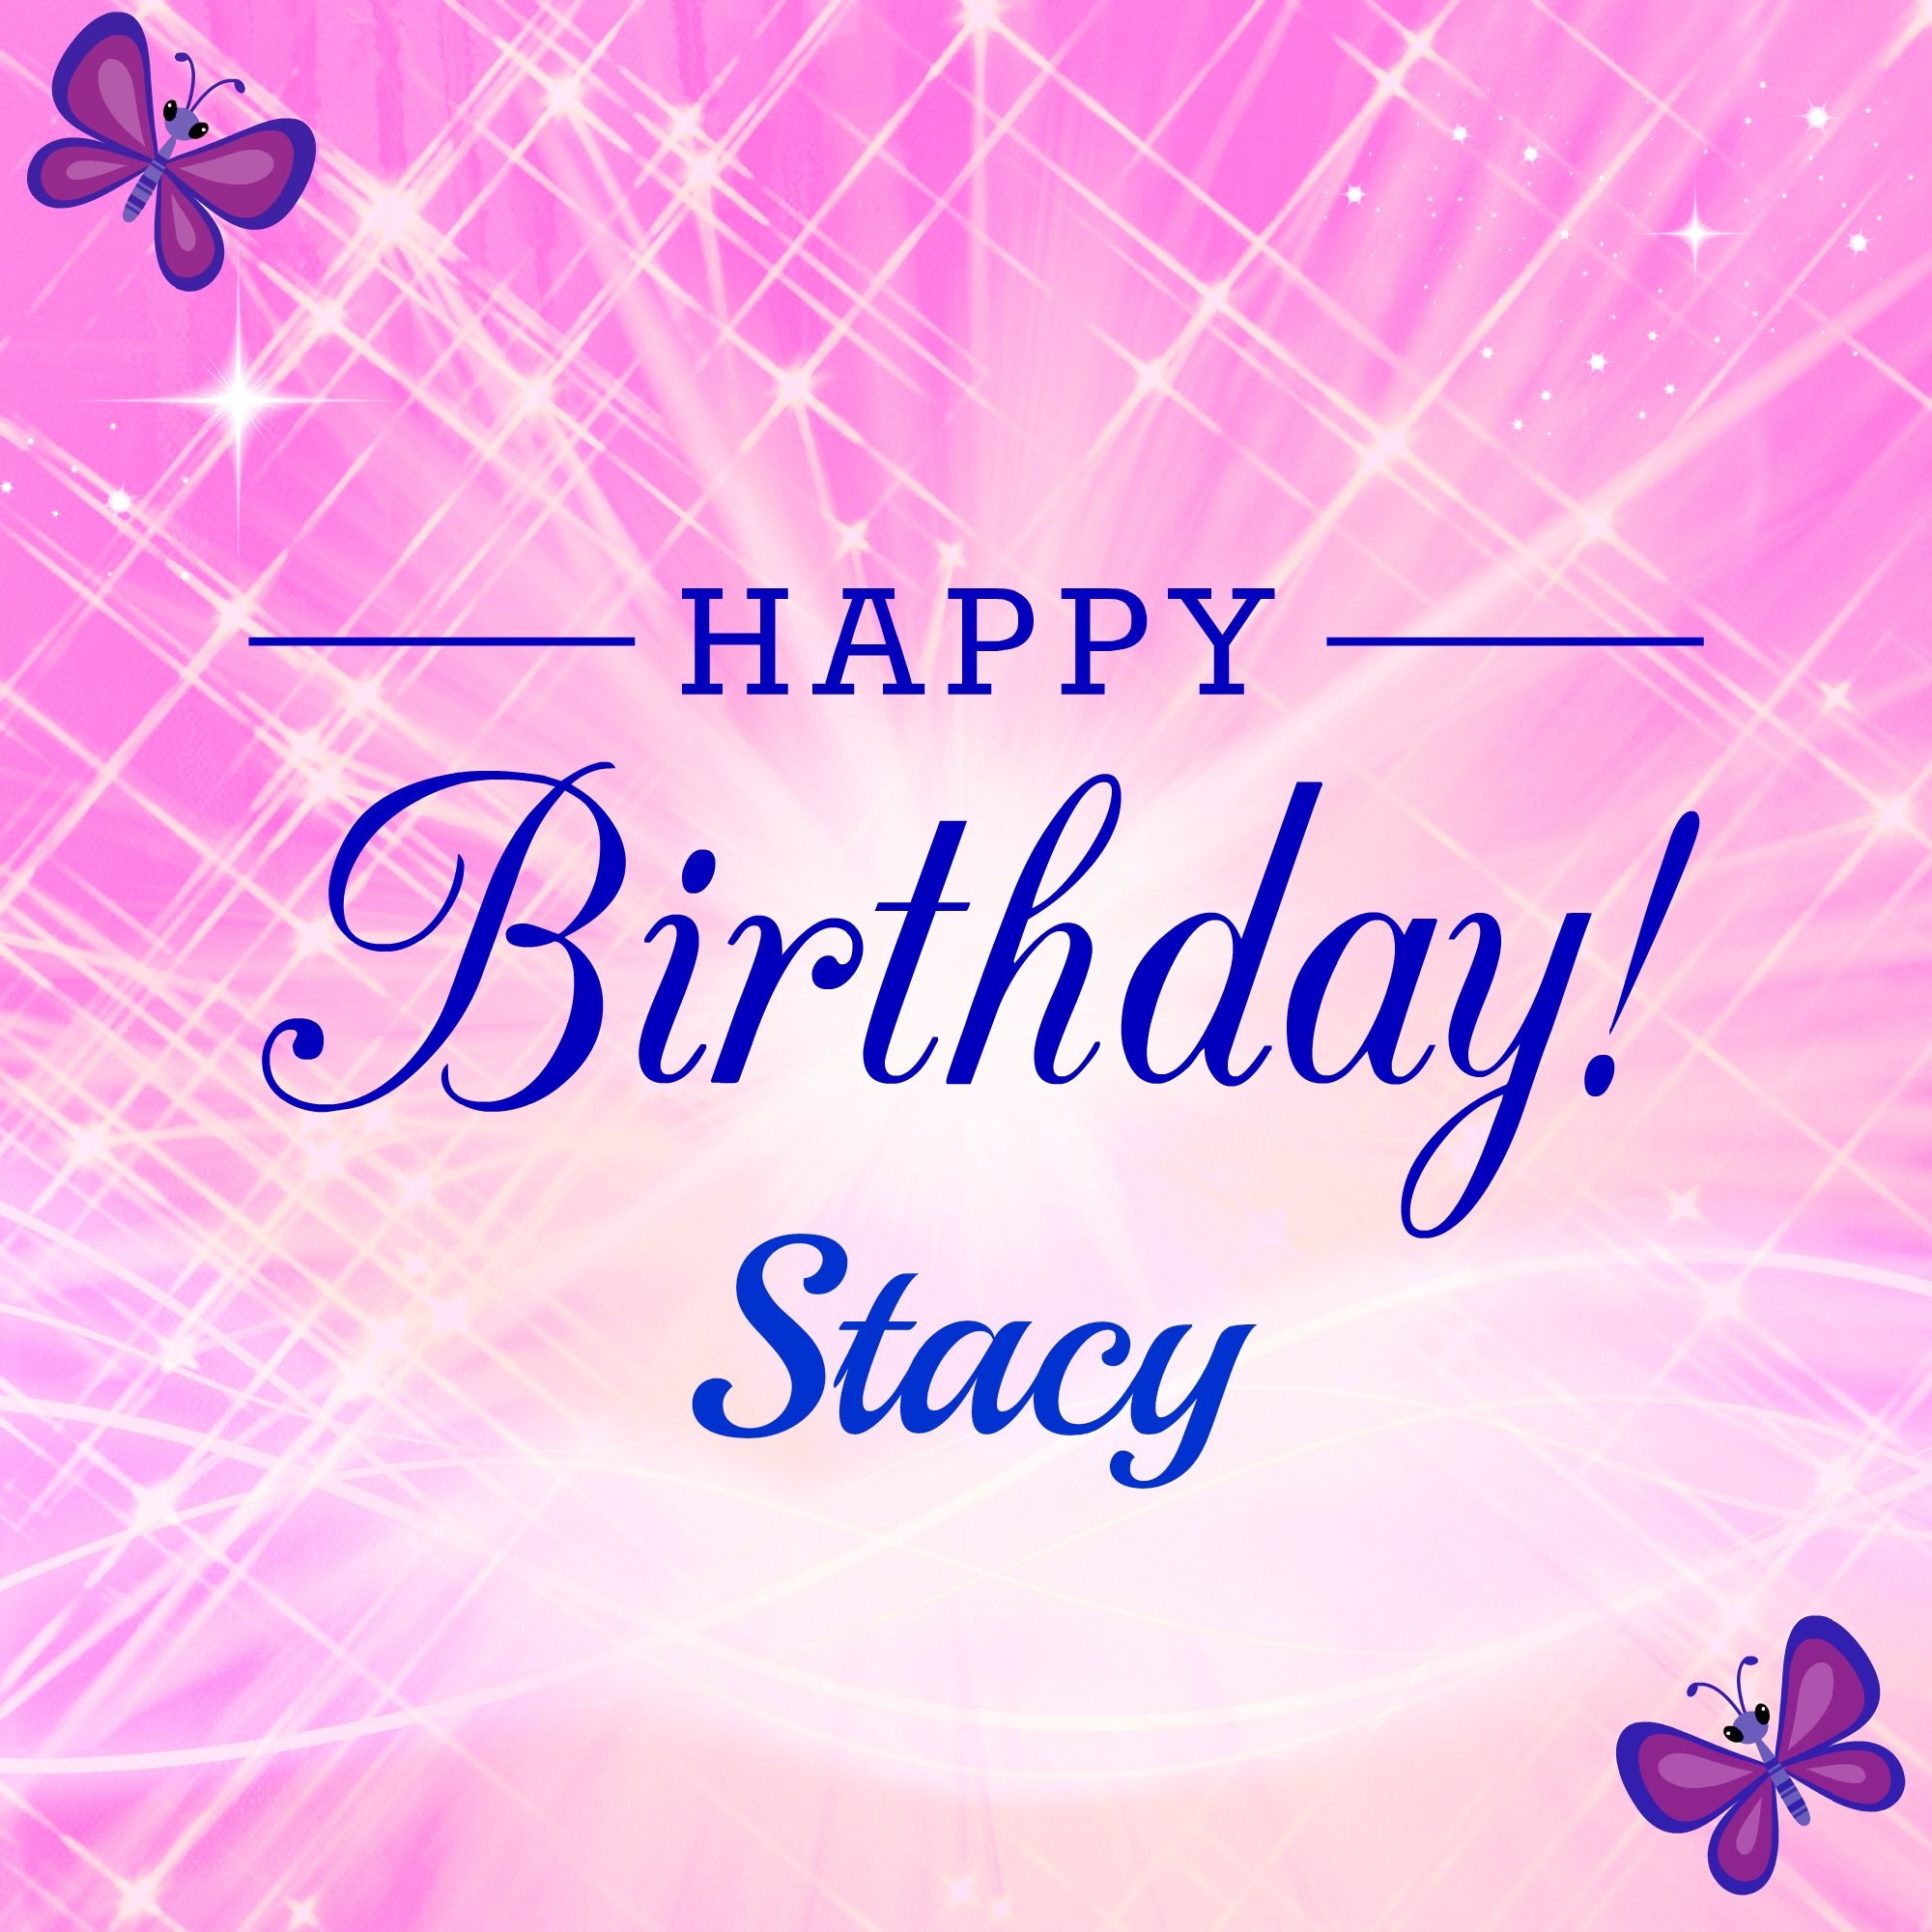 Happy Birthday Stacy